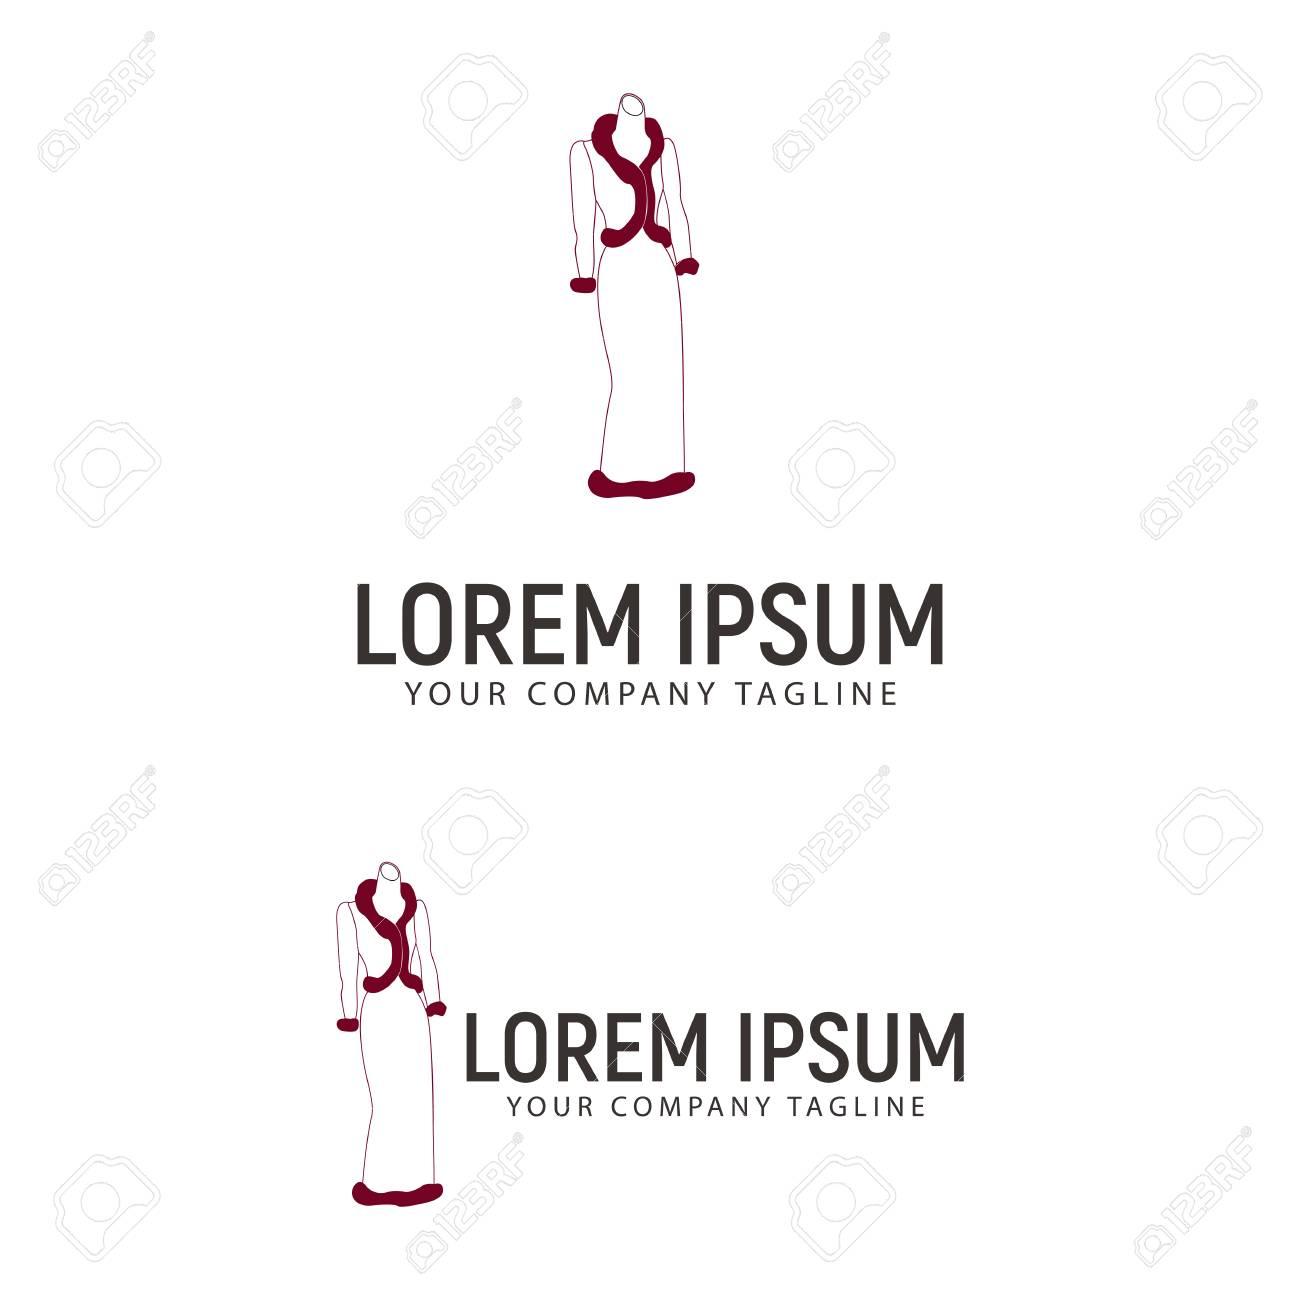 A Women Fashion Logo Design Concept Template Royalty Free Cliparts